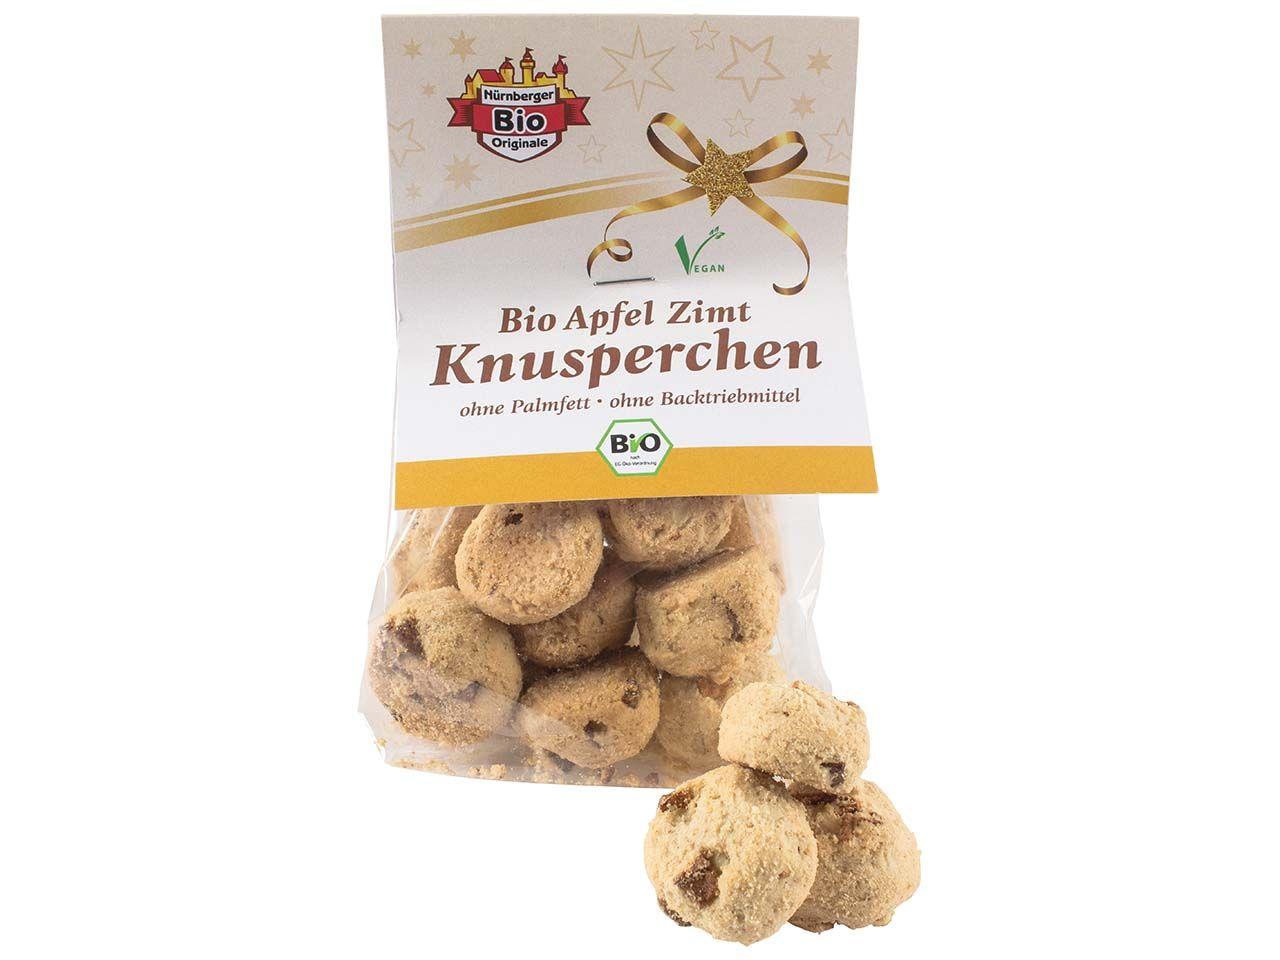 Bio-Apfel-Zimt-Knusperchen, 100 g 2075